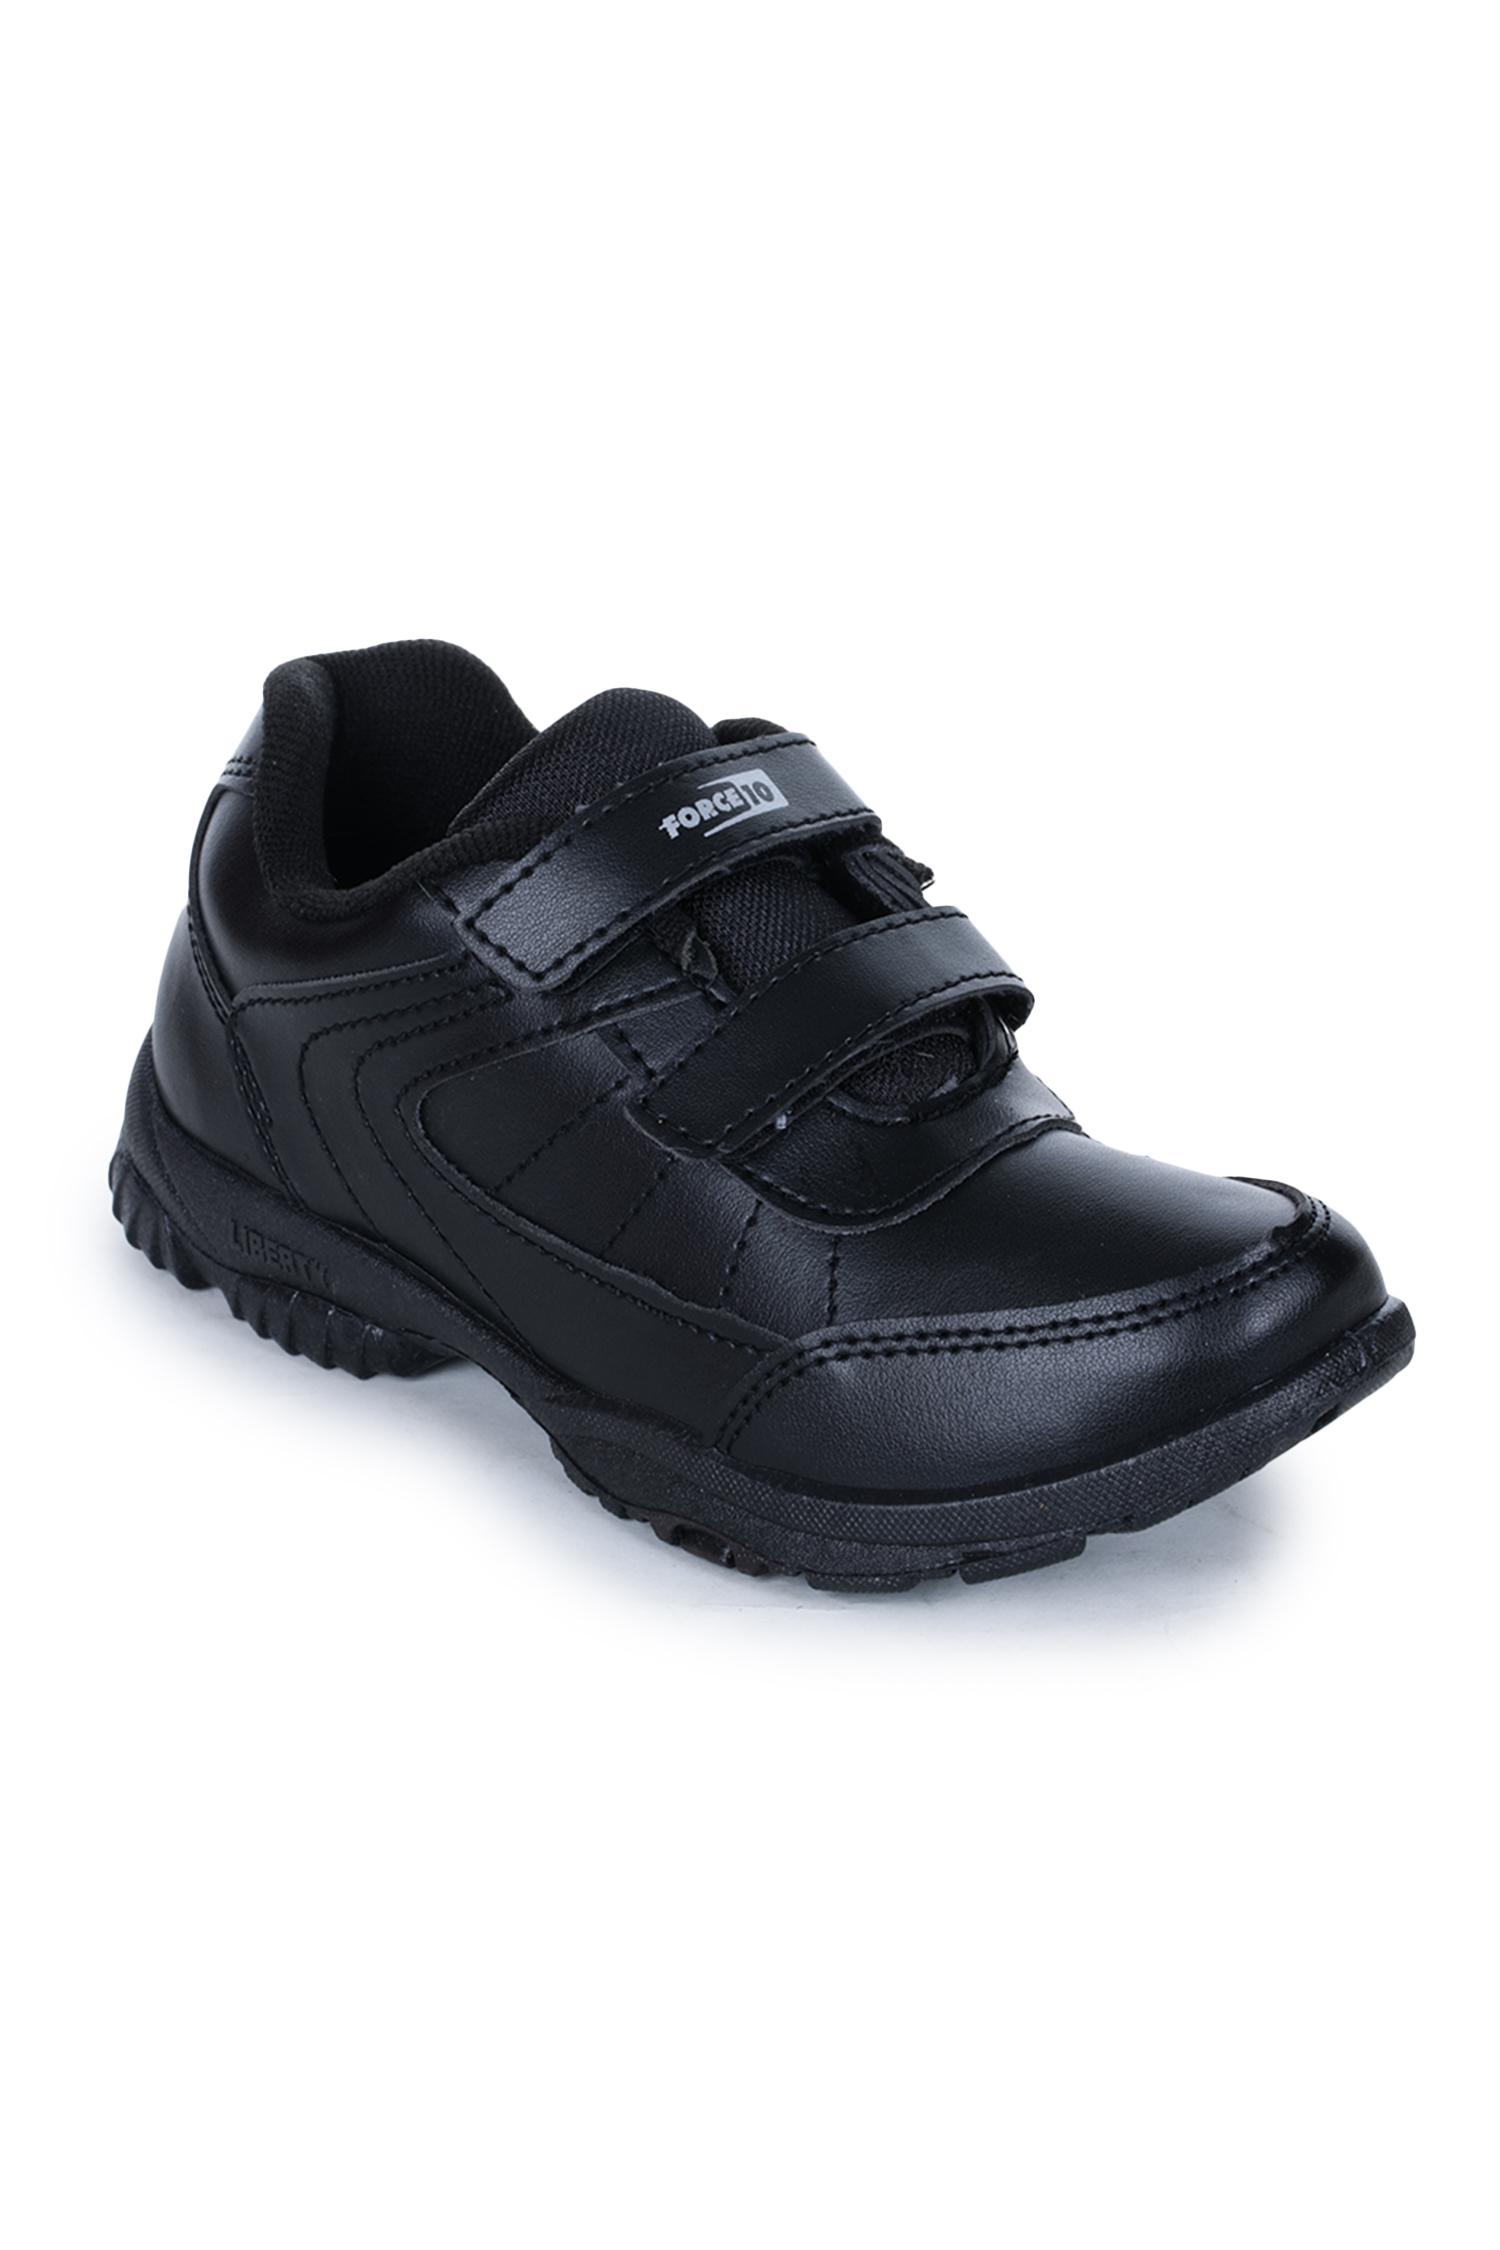 Liberty | Liberty Force 10 Black School Shoes SCHZONE-DV_Black For - Boys